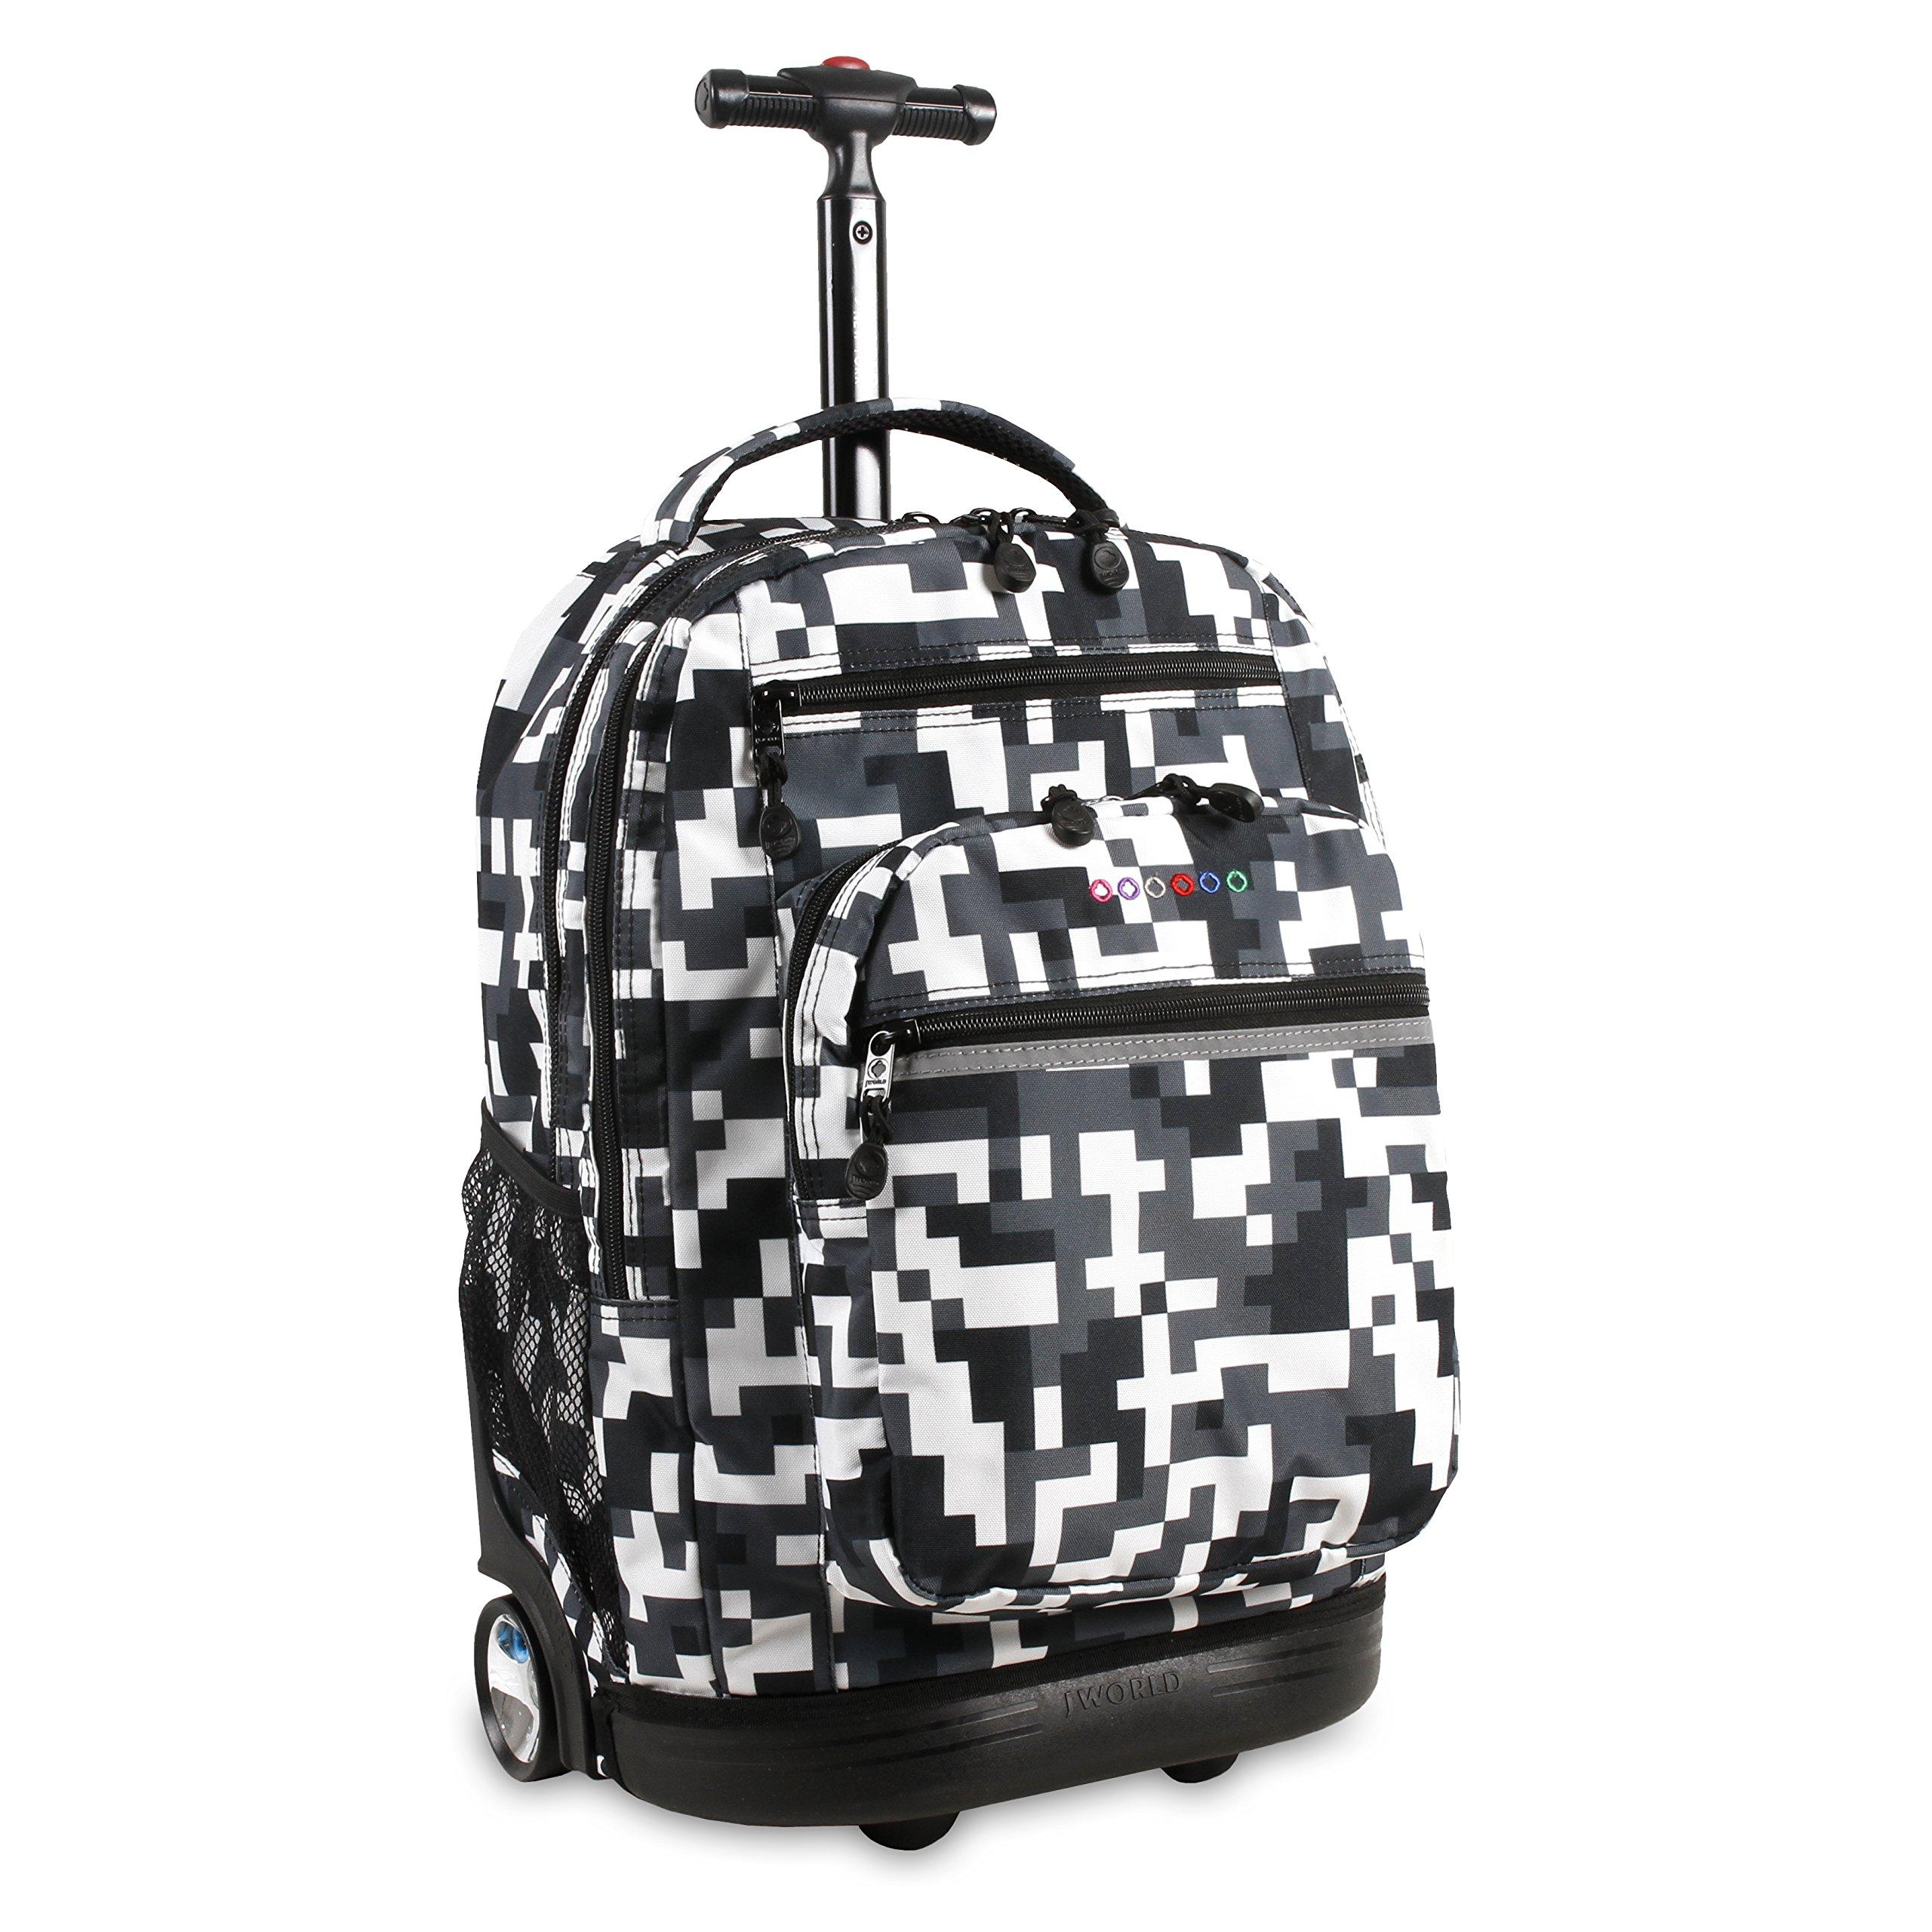 J World New York Sundance Laptop Rolling Backpack Backpack, CAMO by J World New York